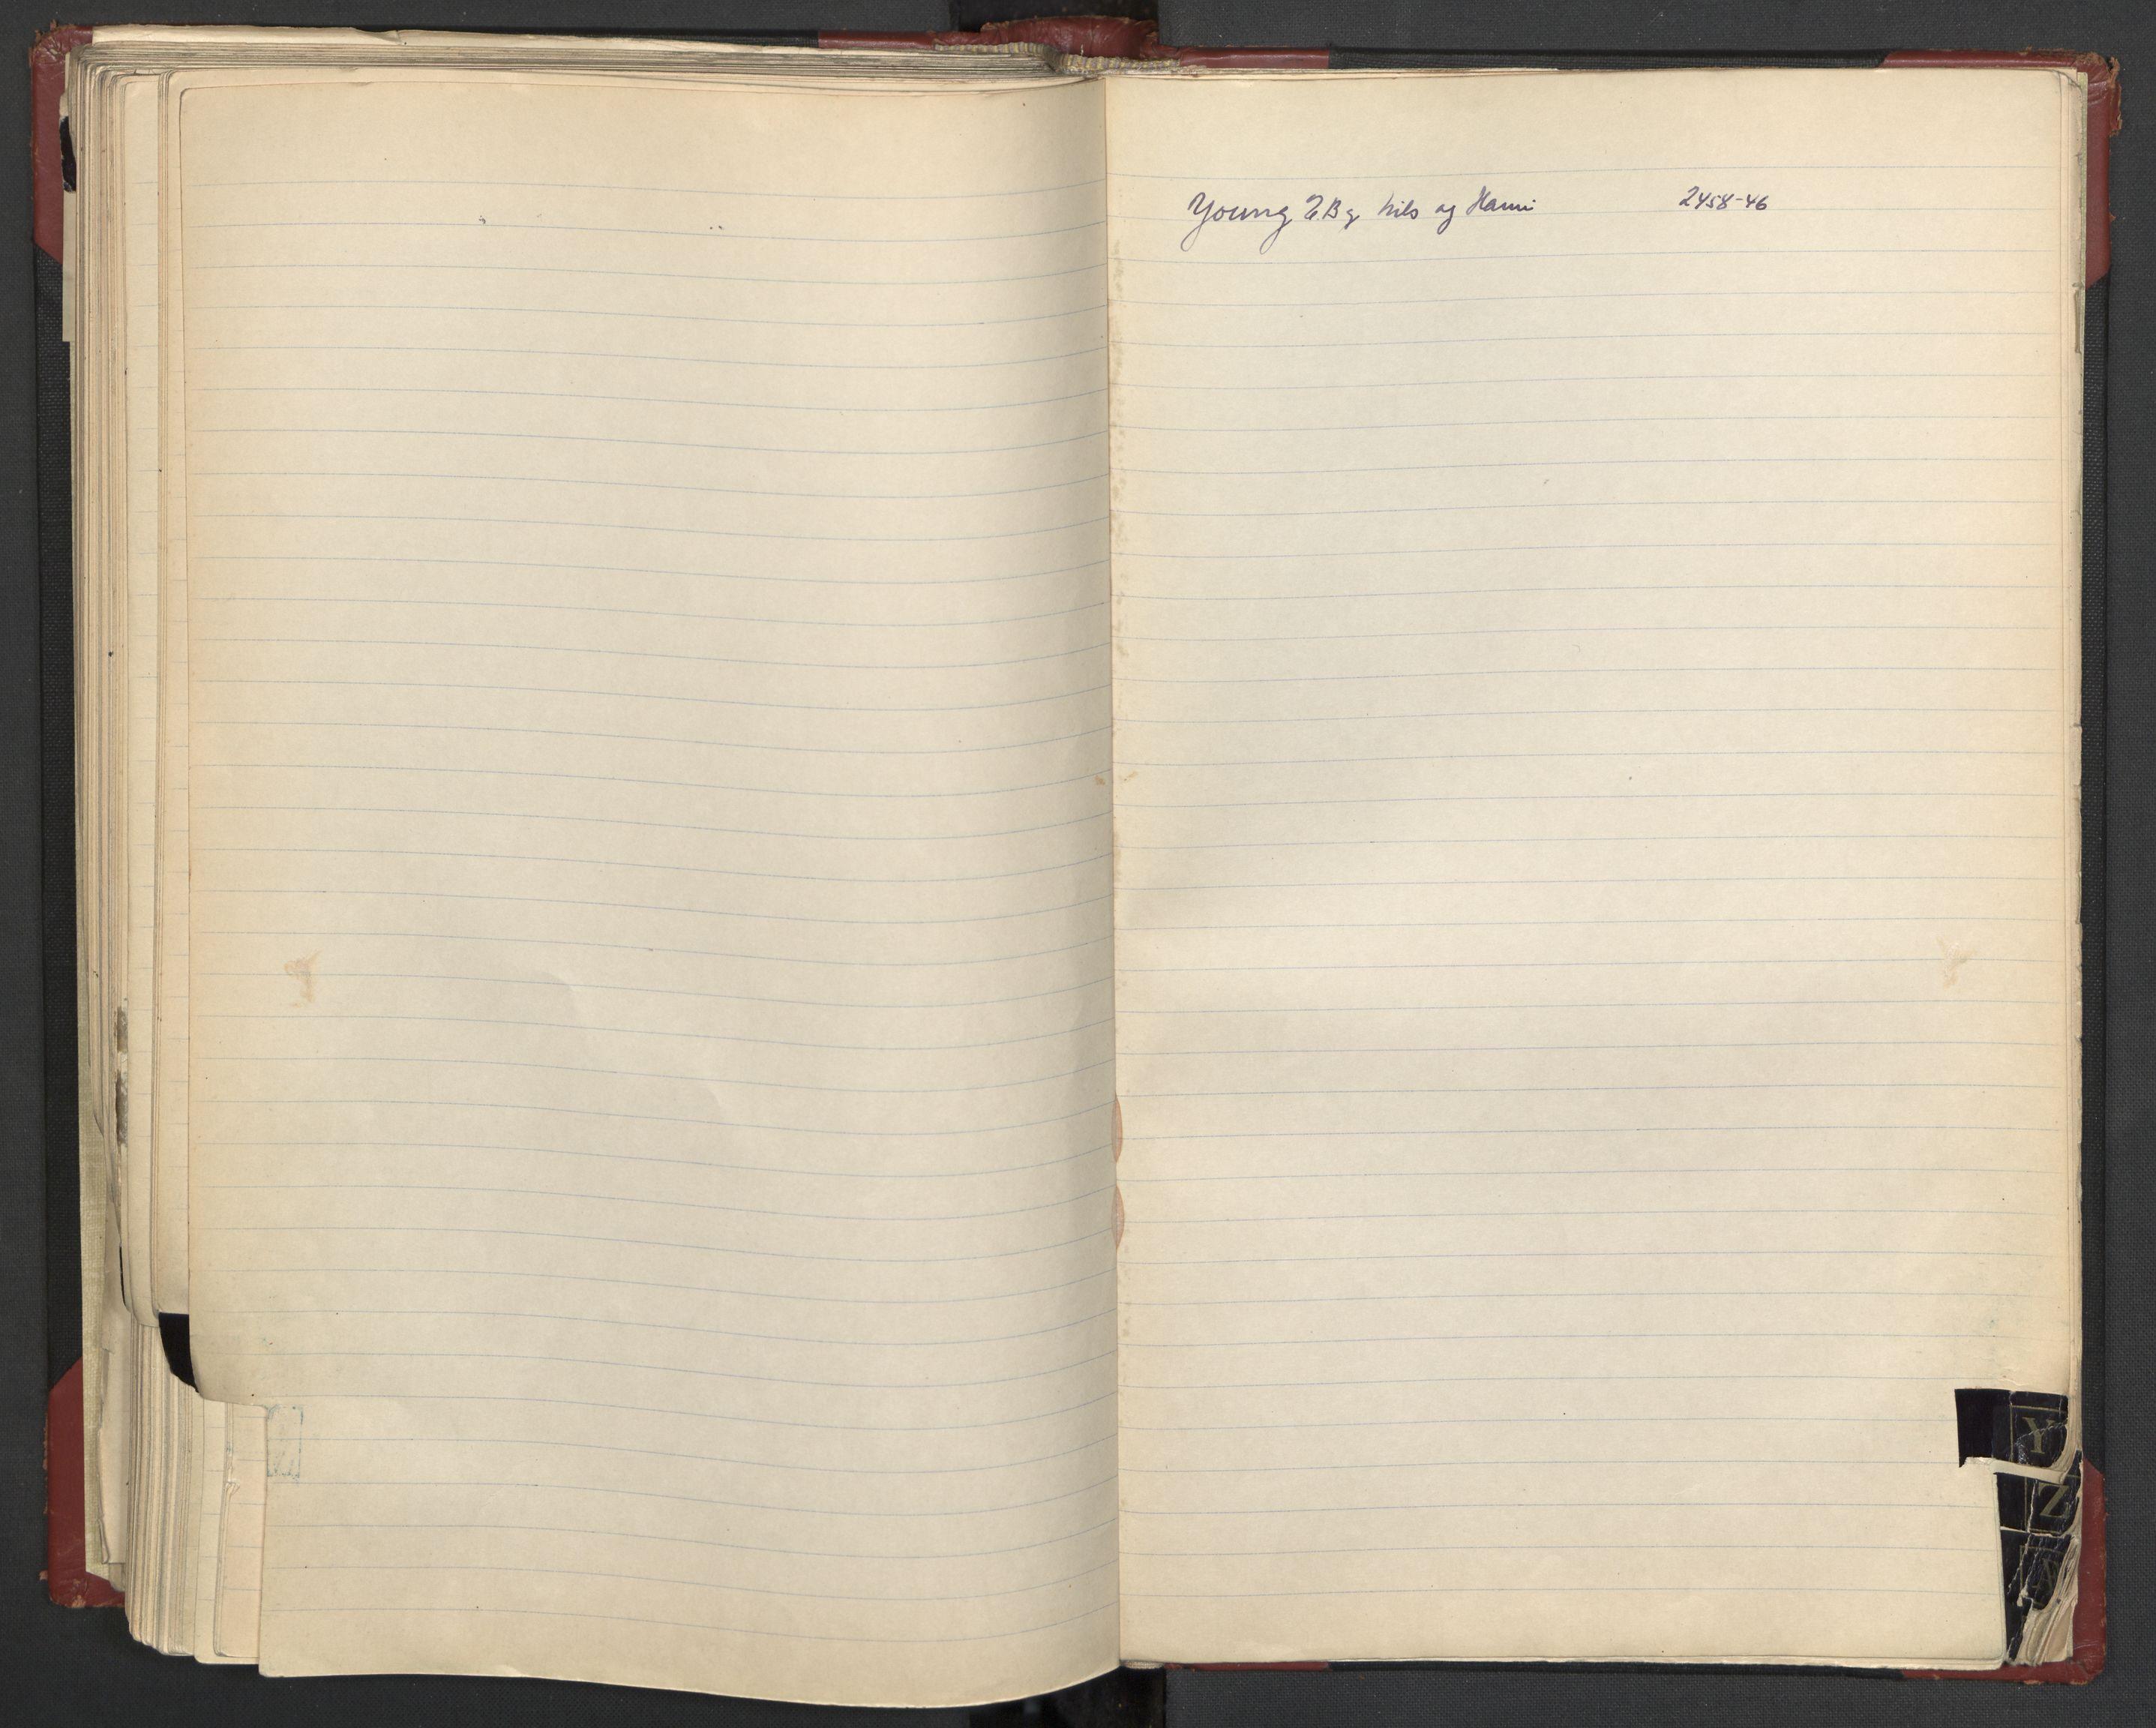 RA, Justisdepartementet, 3. politikontor P3, C/Cc/L0002: Journalregister over statsborgersaker, 1940-1946, s. 110